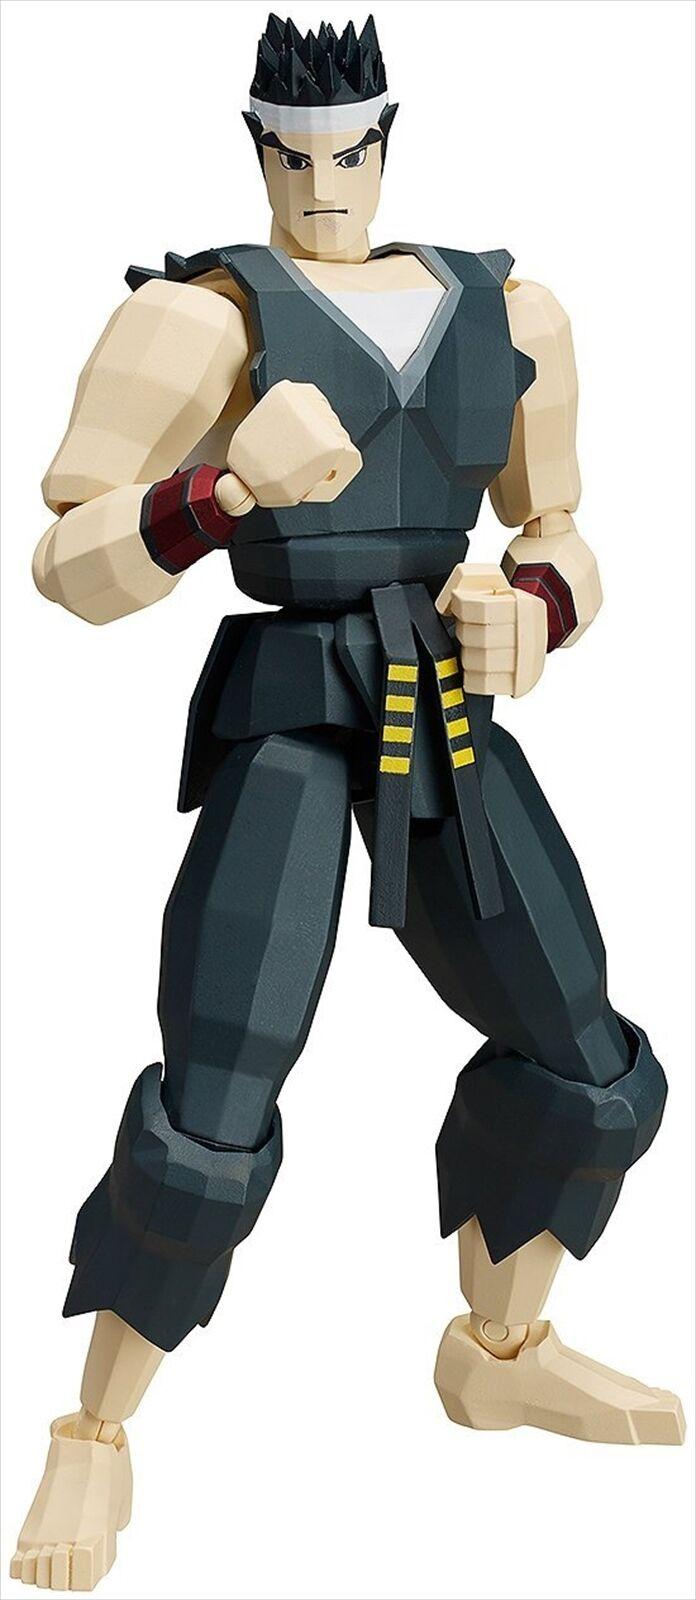 FREEing Virtua Fighter Akira Yugi figma Action Figure